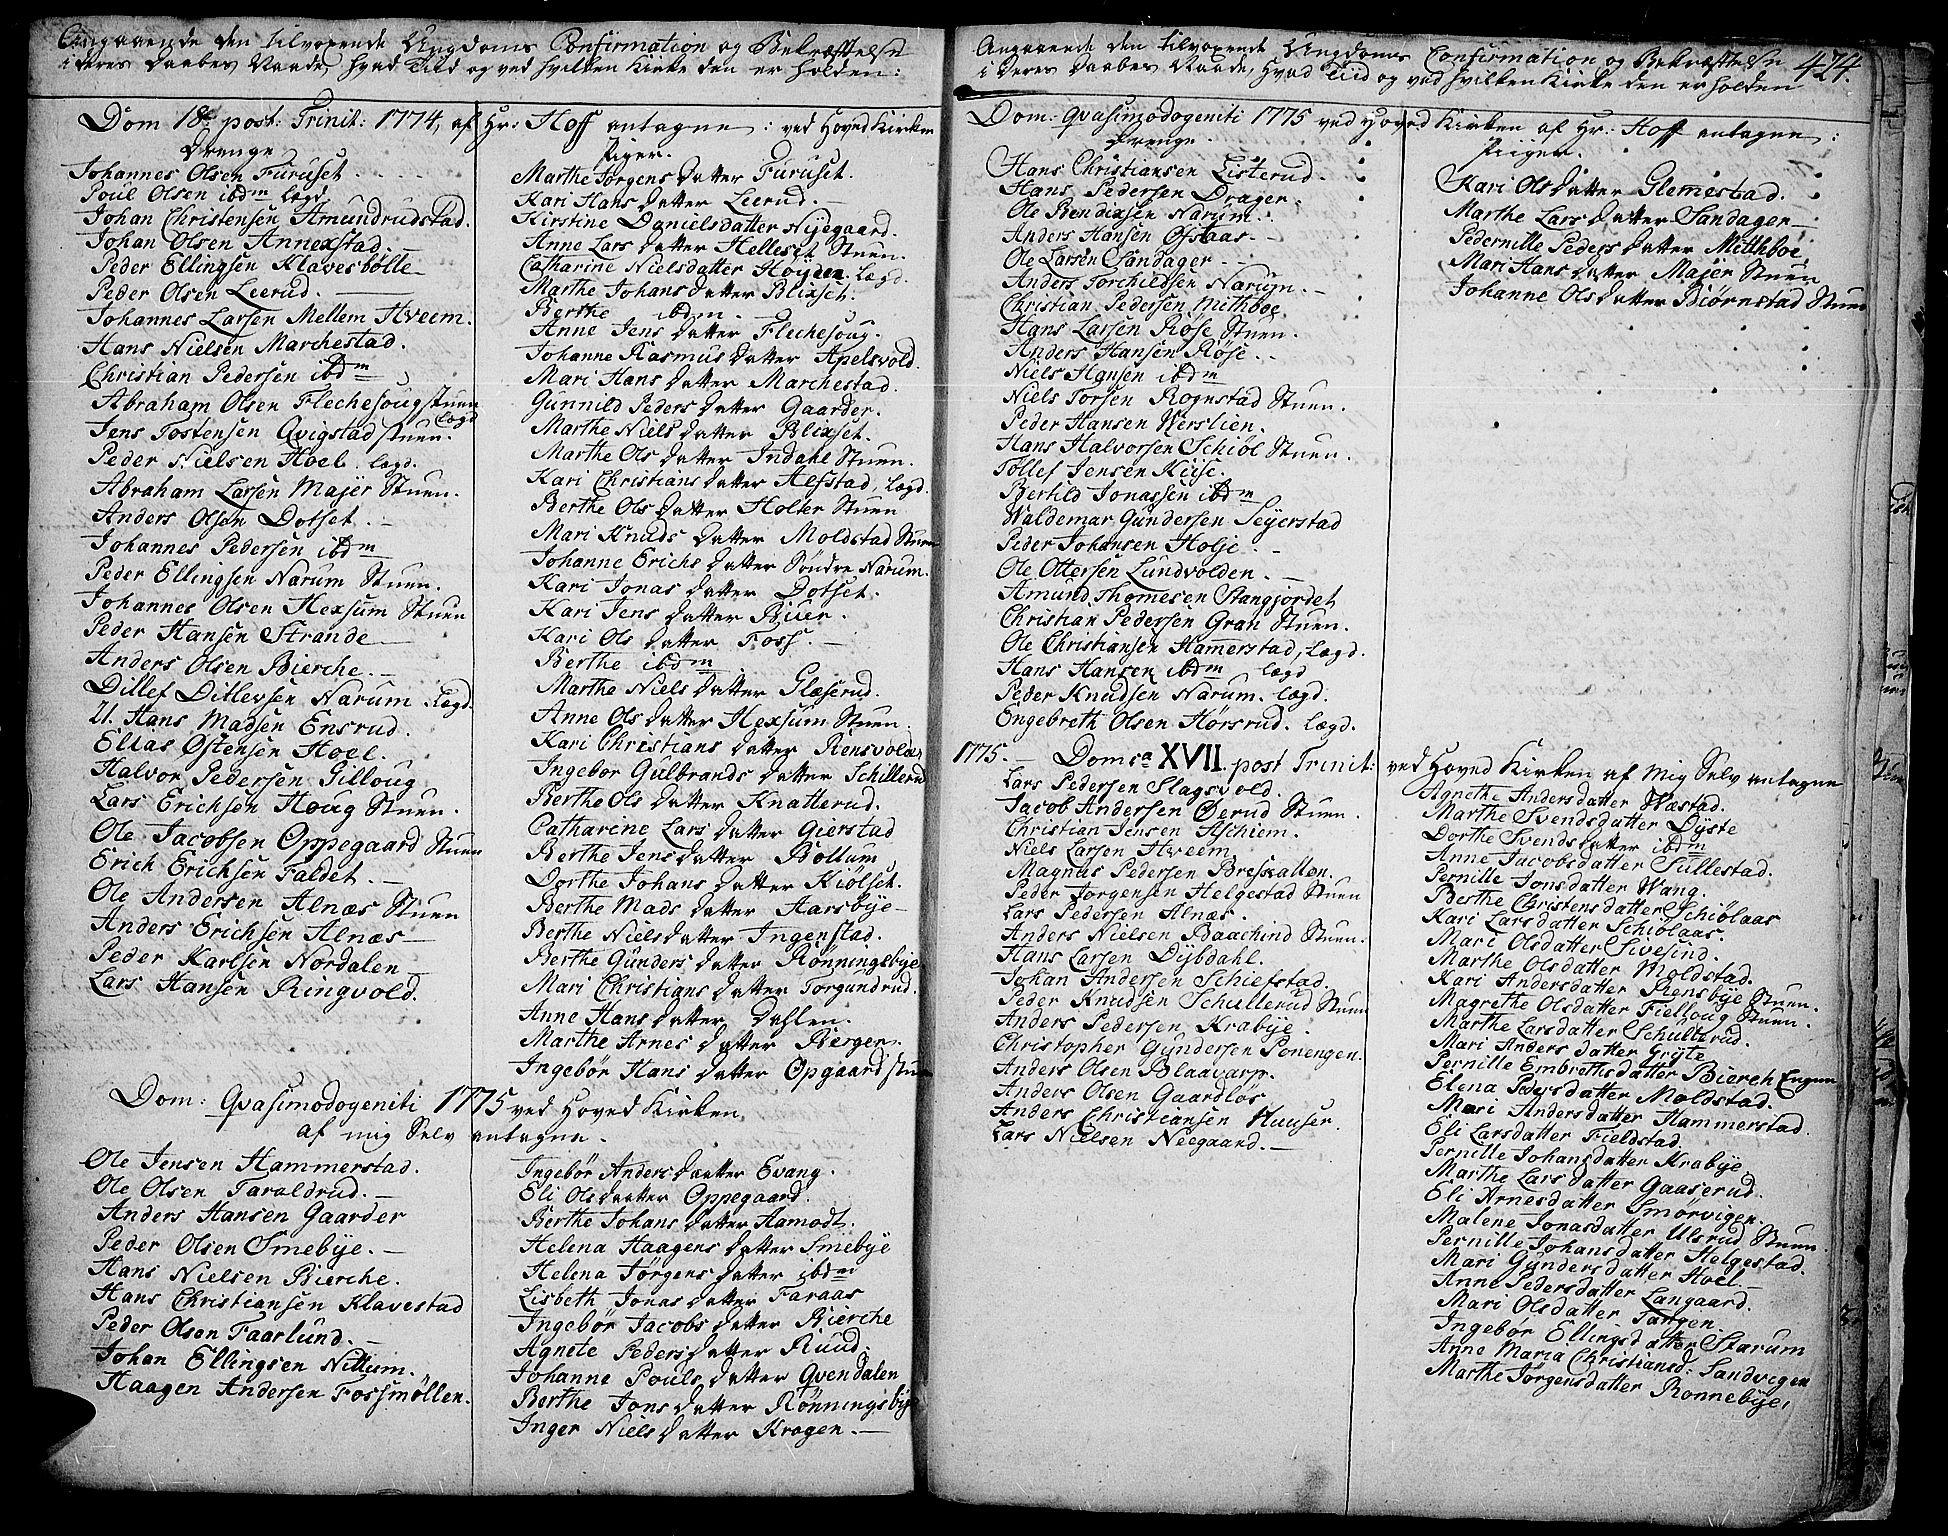 SAH, Toten prestekontor, Ministerialbok nr. 6, 1773-1793, s. 424